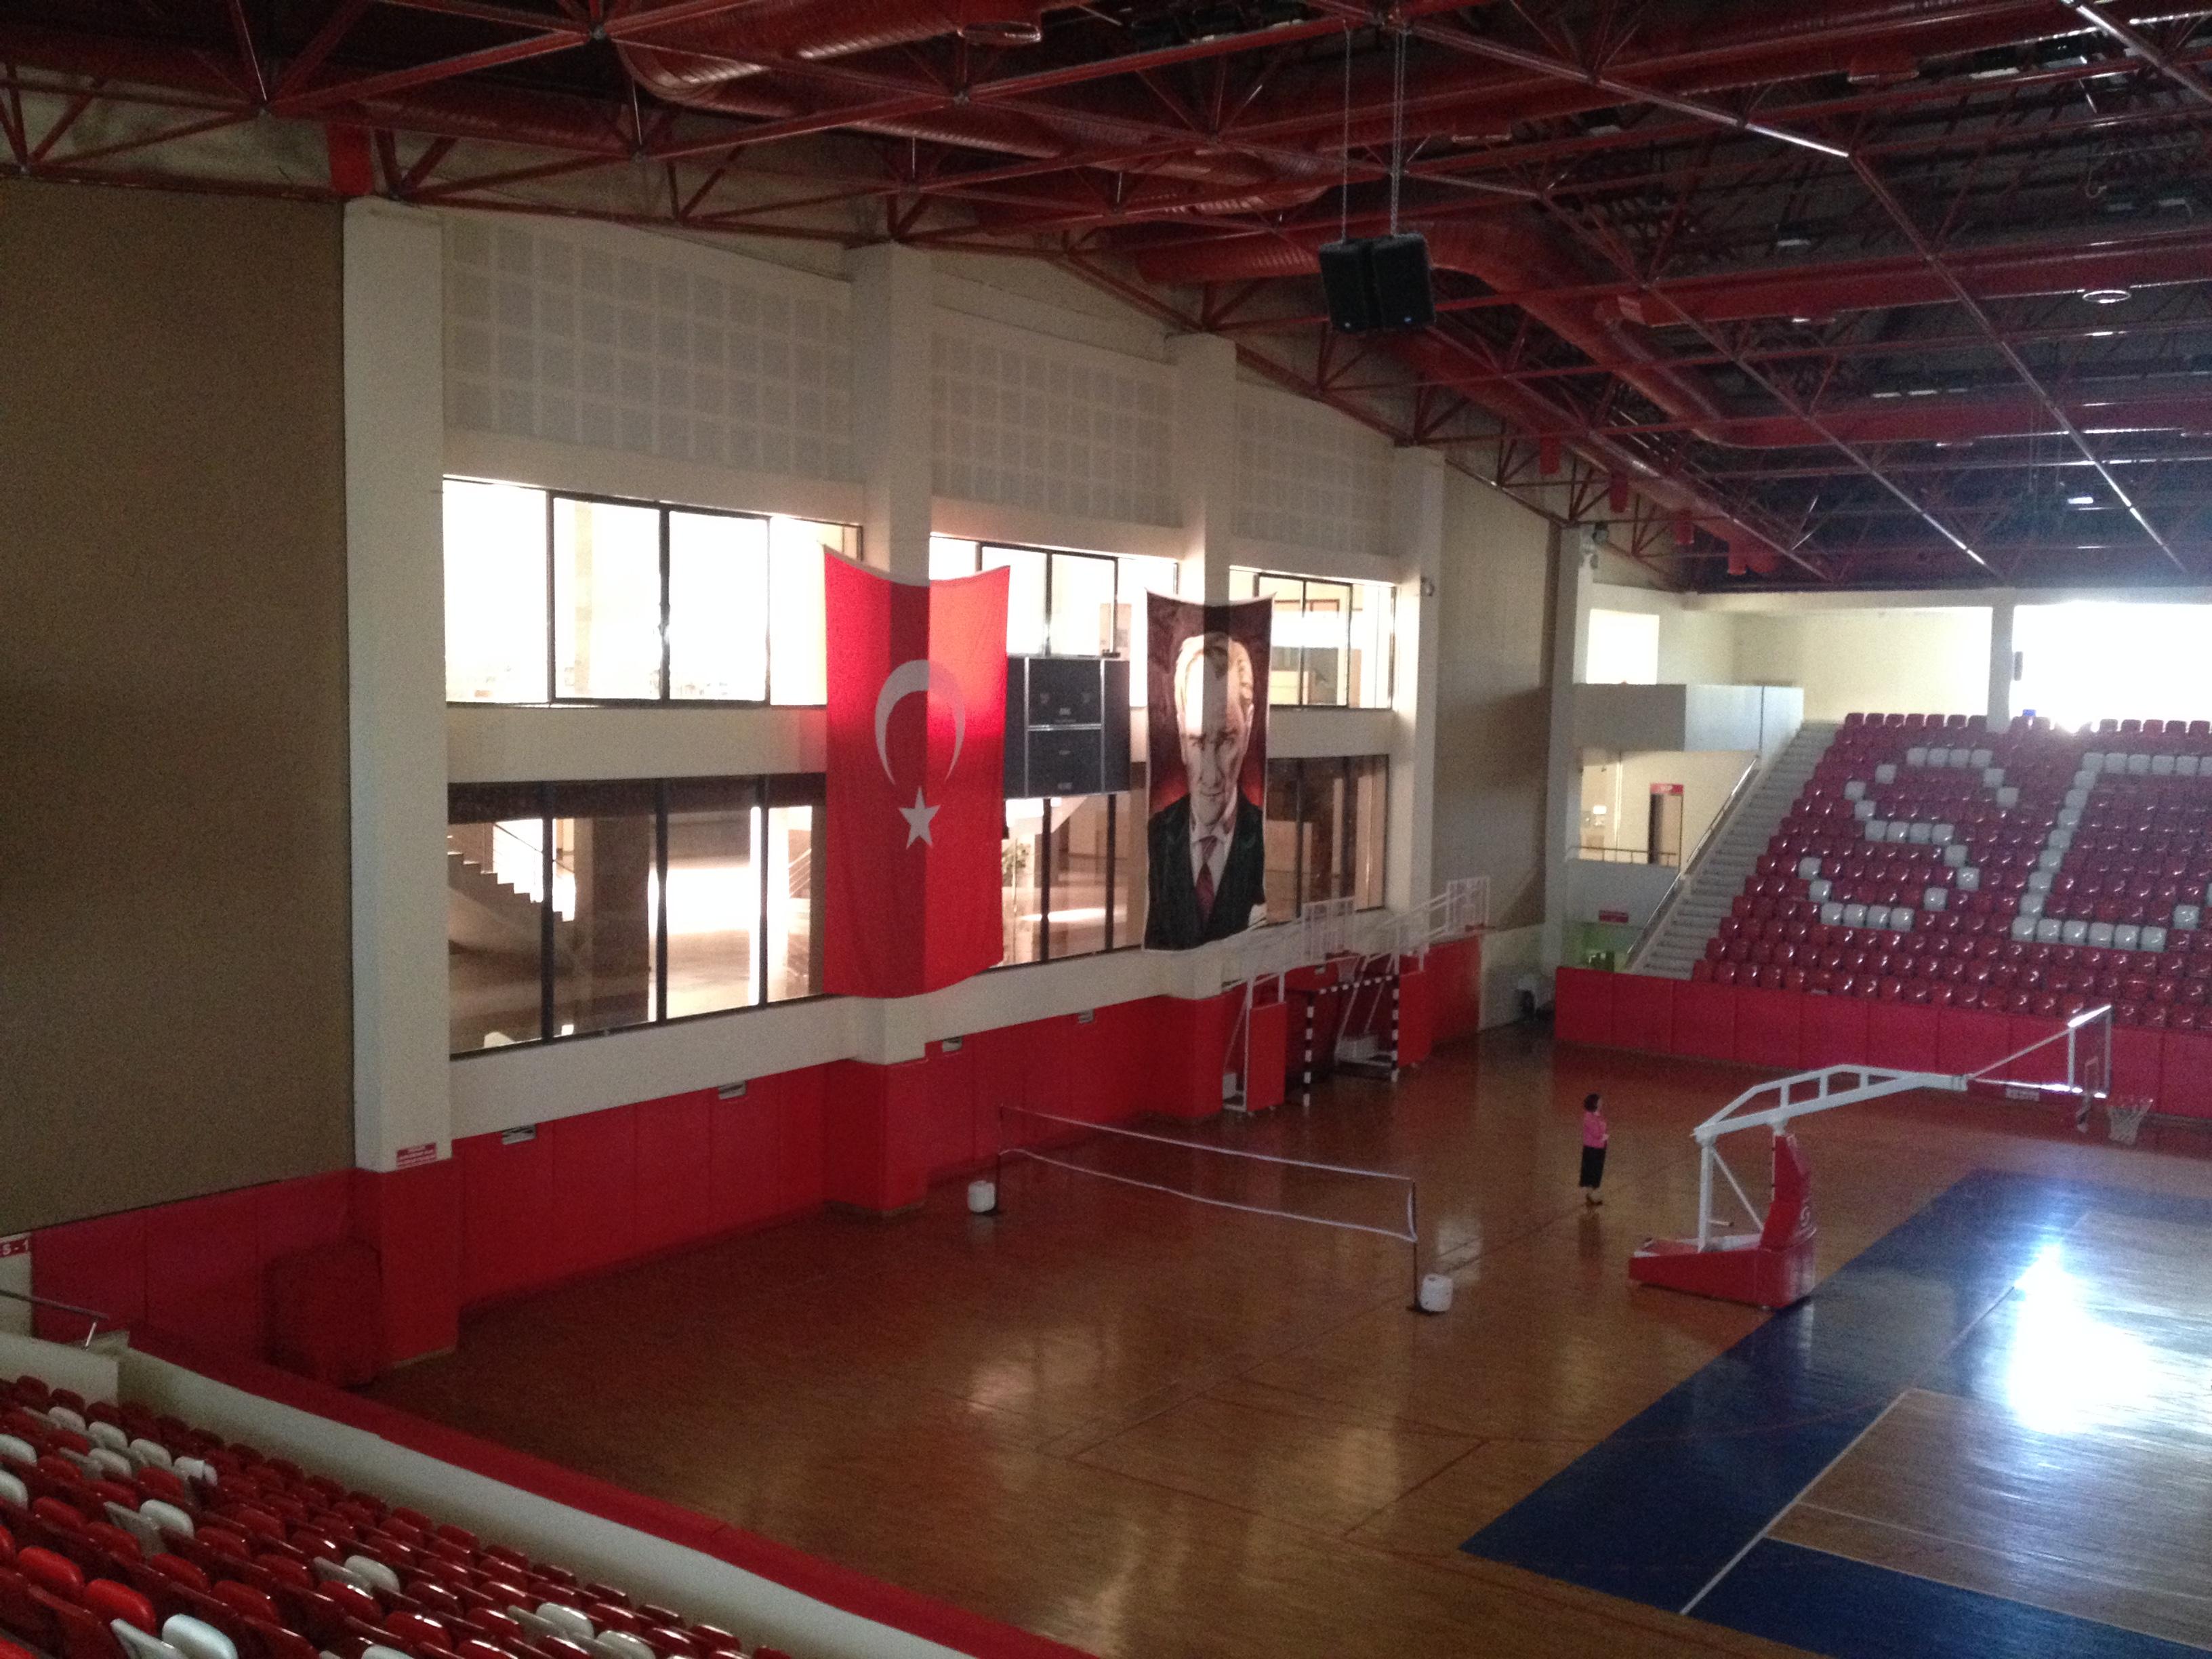 sdü spor salonu (4)